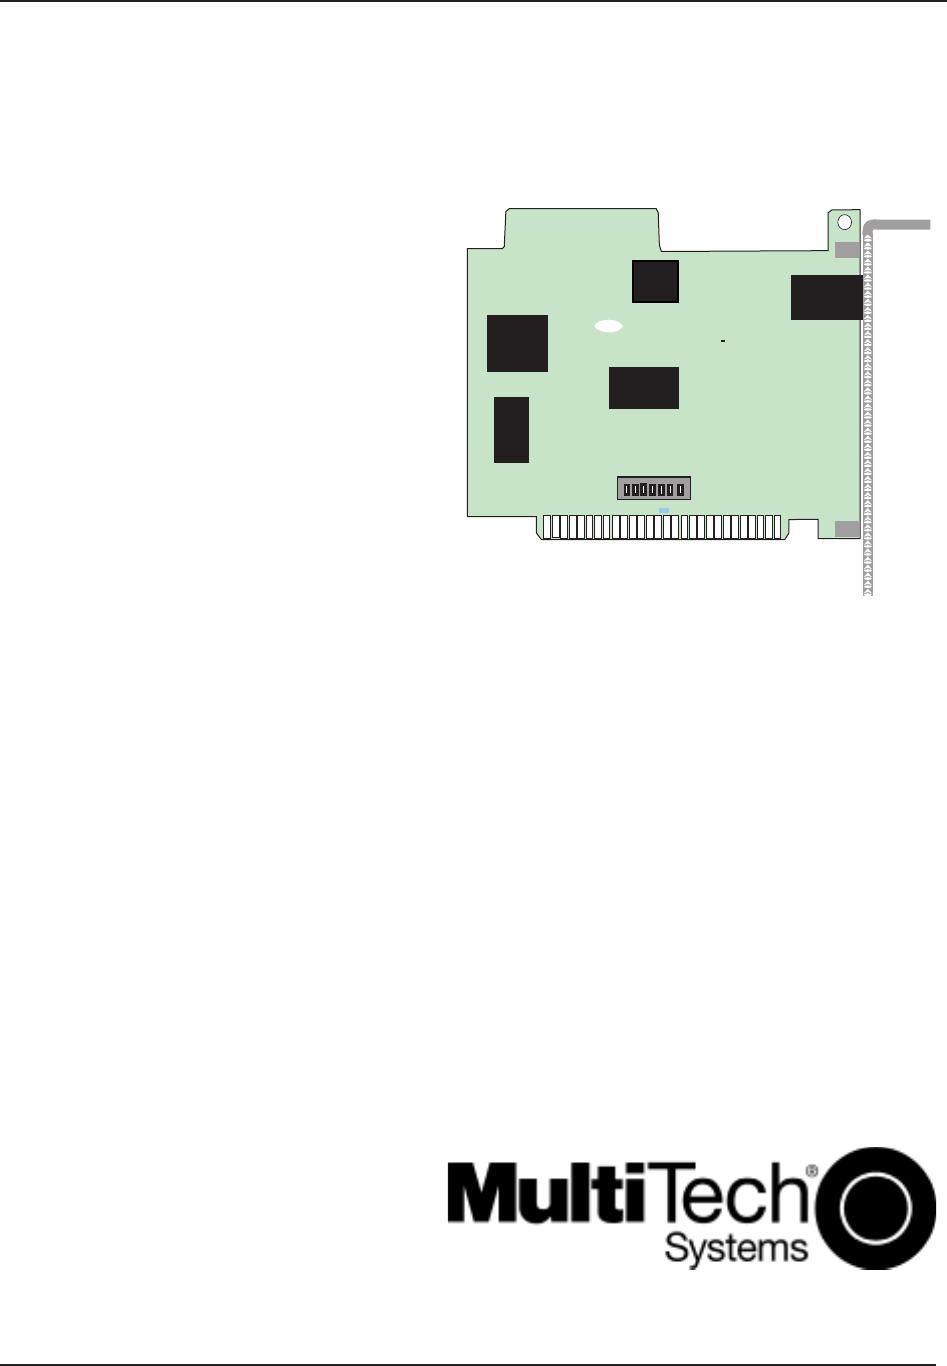 Multi Tech Systems Multimodem Mt5634zpx V 92 Isa Users Manual Logic Diagram S000372cp65